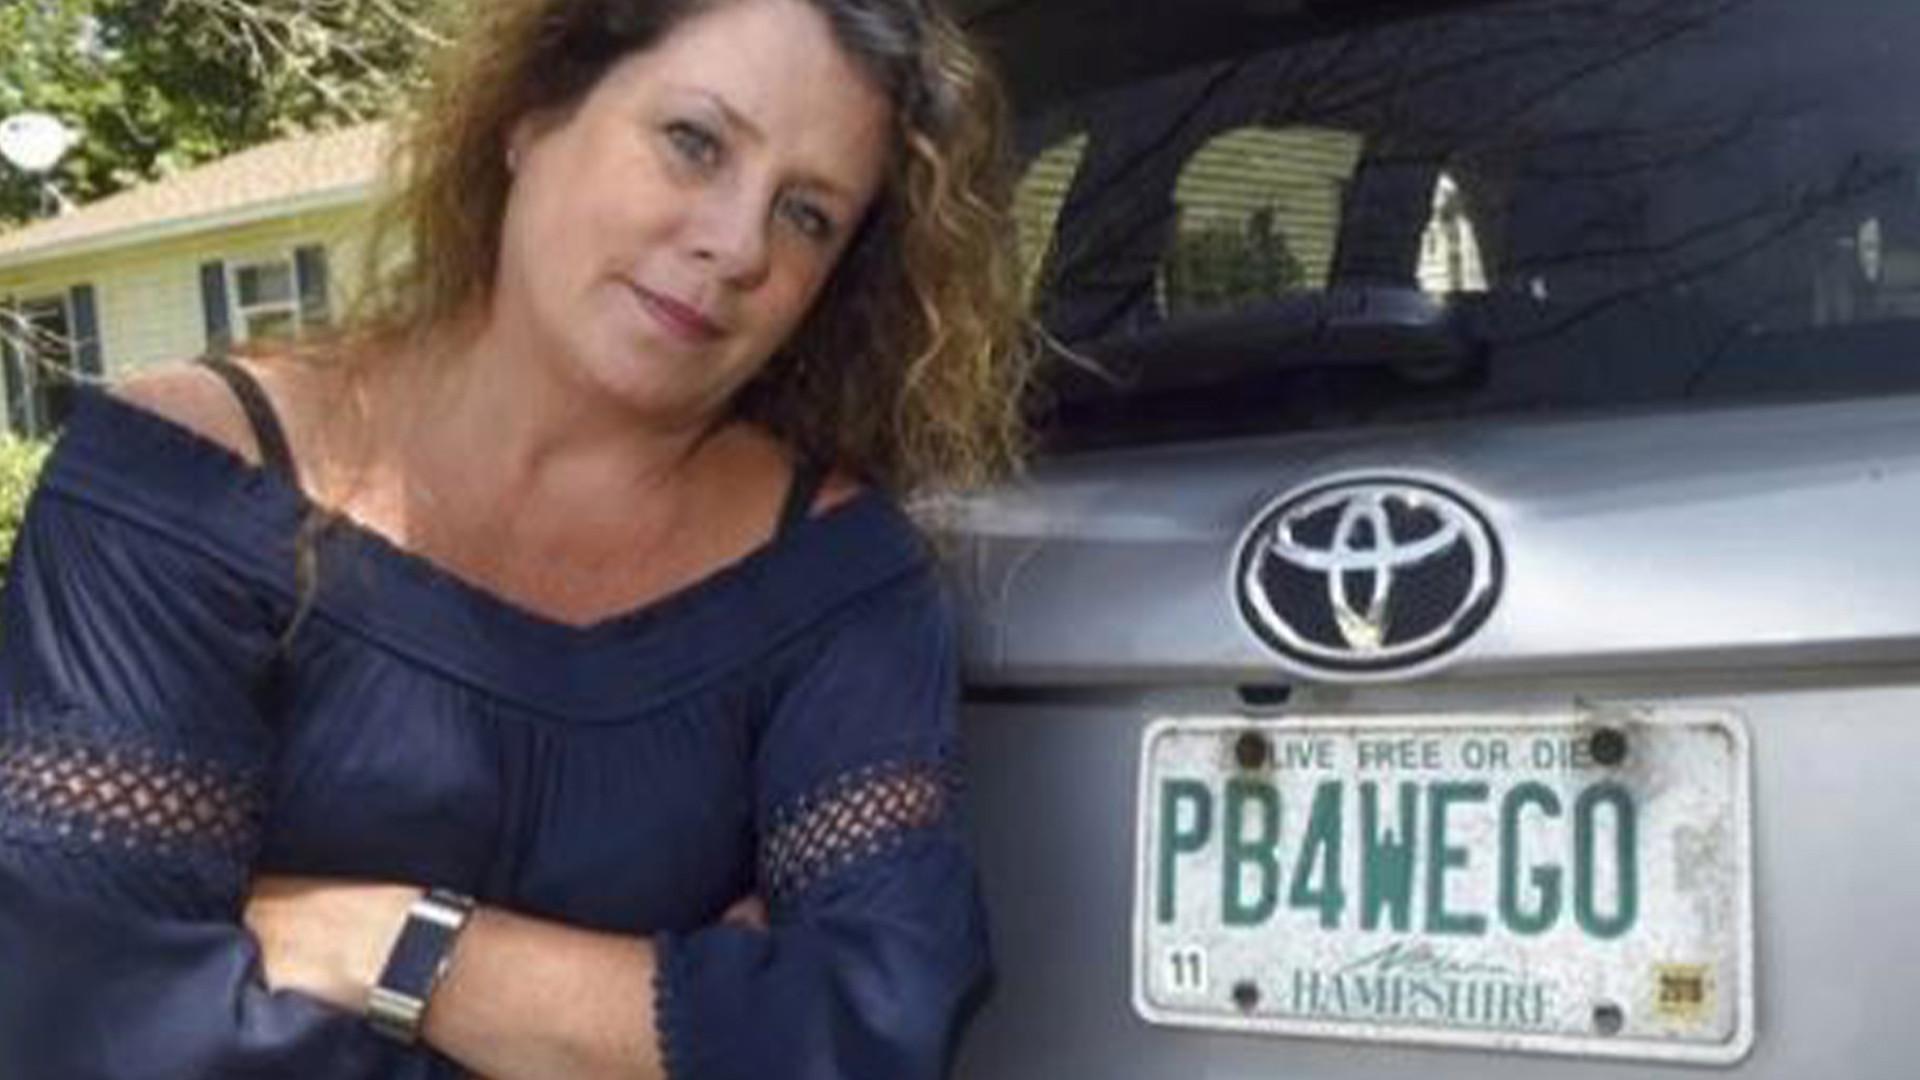 New Hampshire mom wins battle over 'PB4WEGO' vanity plate